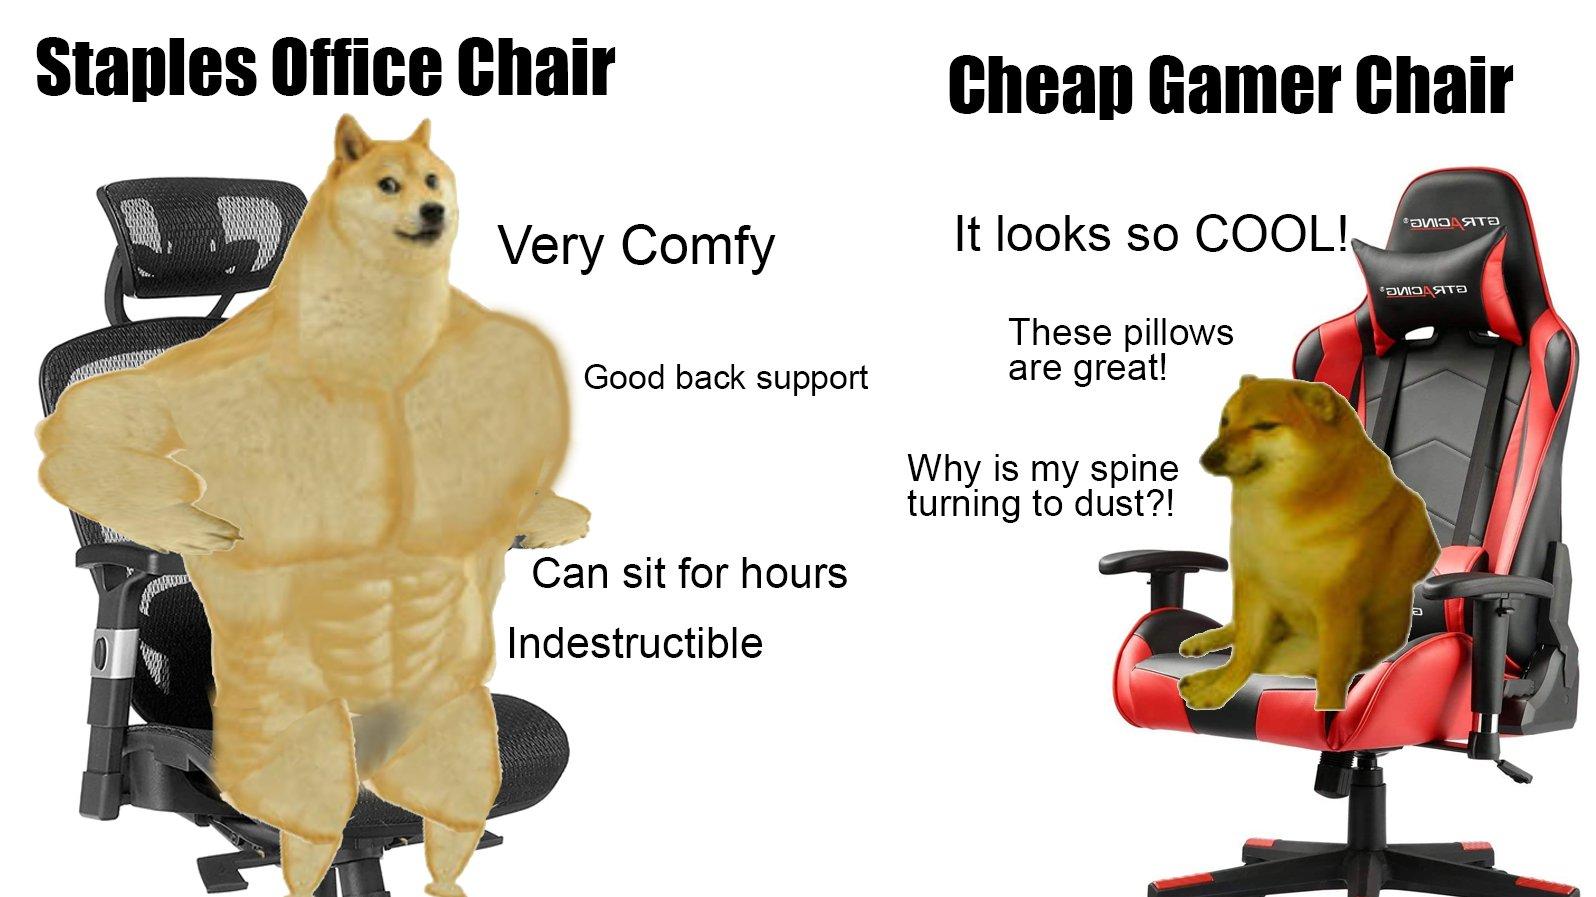 Memes Gamer chair